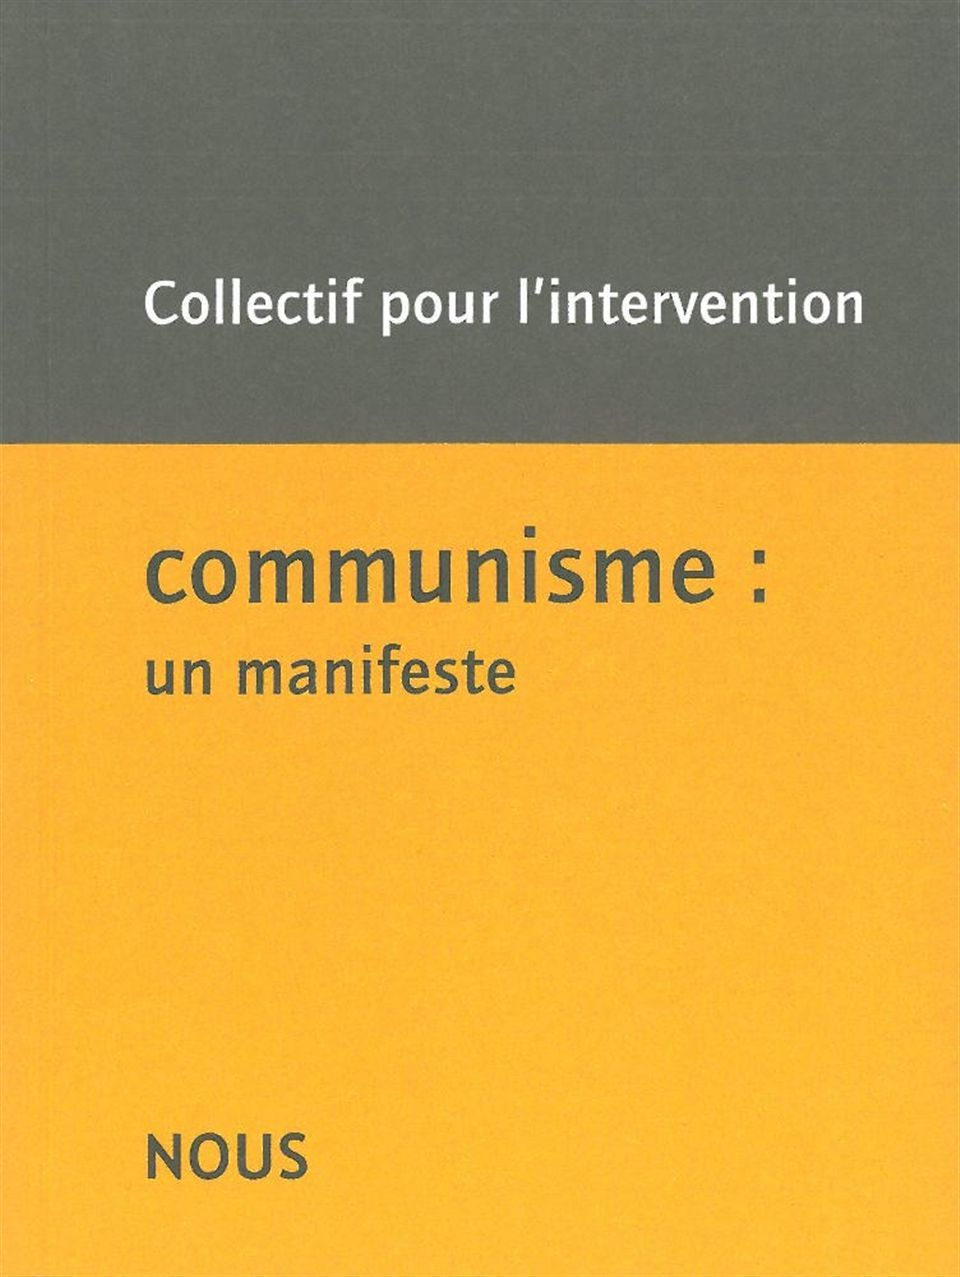 COMMUNISME : UN MANIFESTE